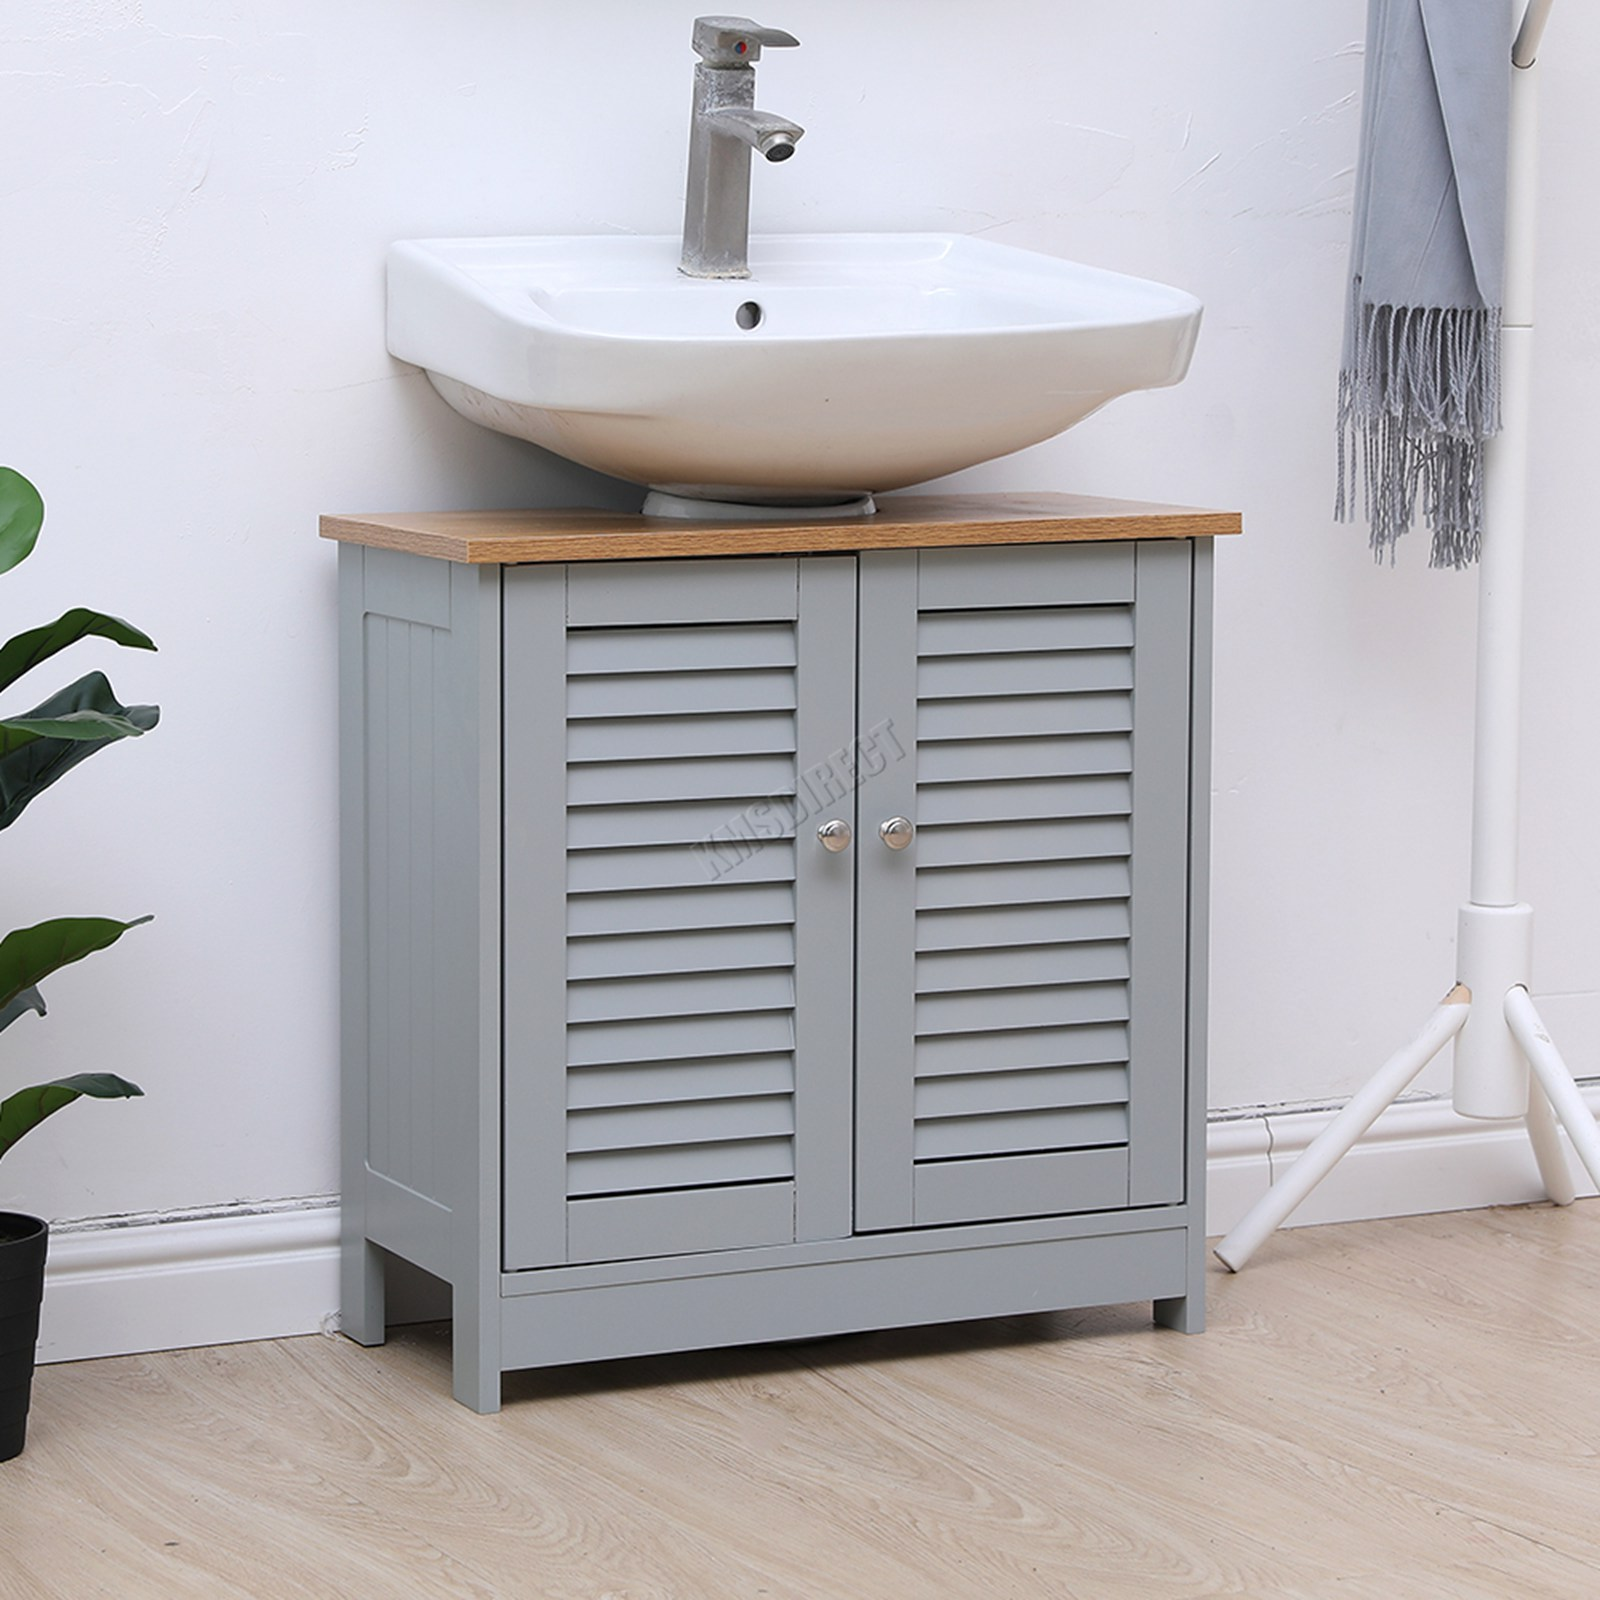 WestWood Bathroom Furniture Range Cabinet Under Sink ...